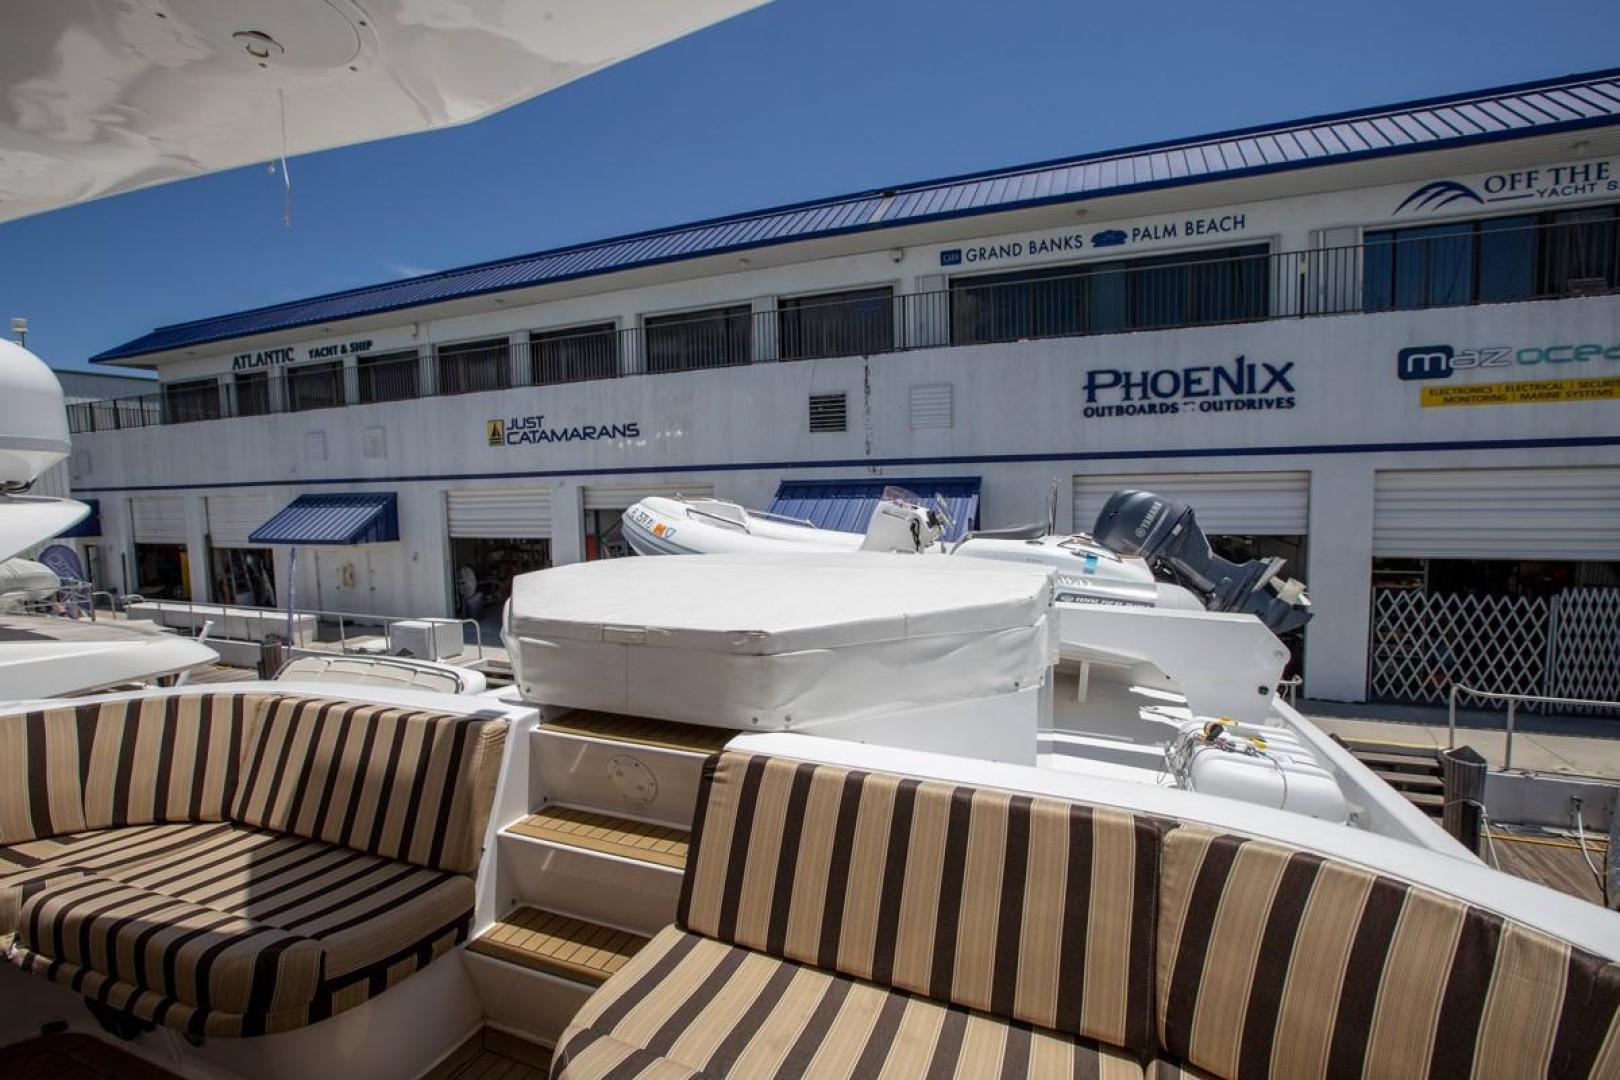 Hatteras-Cockpit Motor Yacht 2000-Getaway Ft. Lauderdale-Florida-United States-977399 | Thumbnail